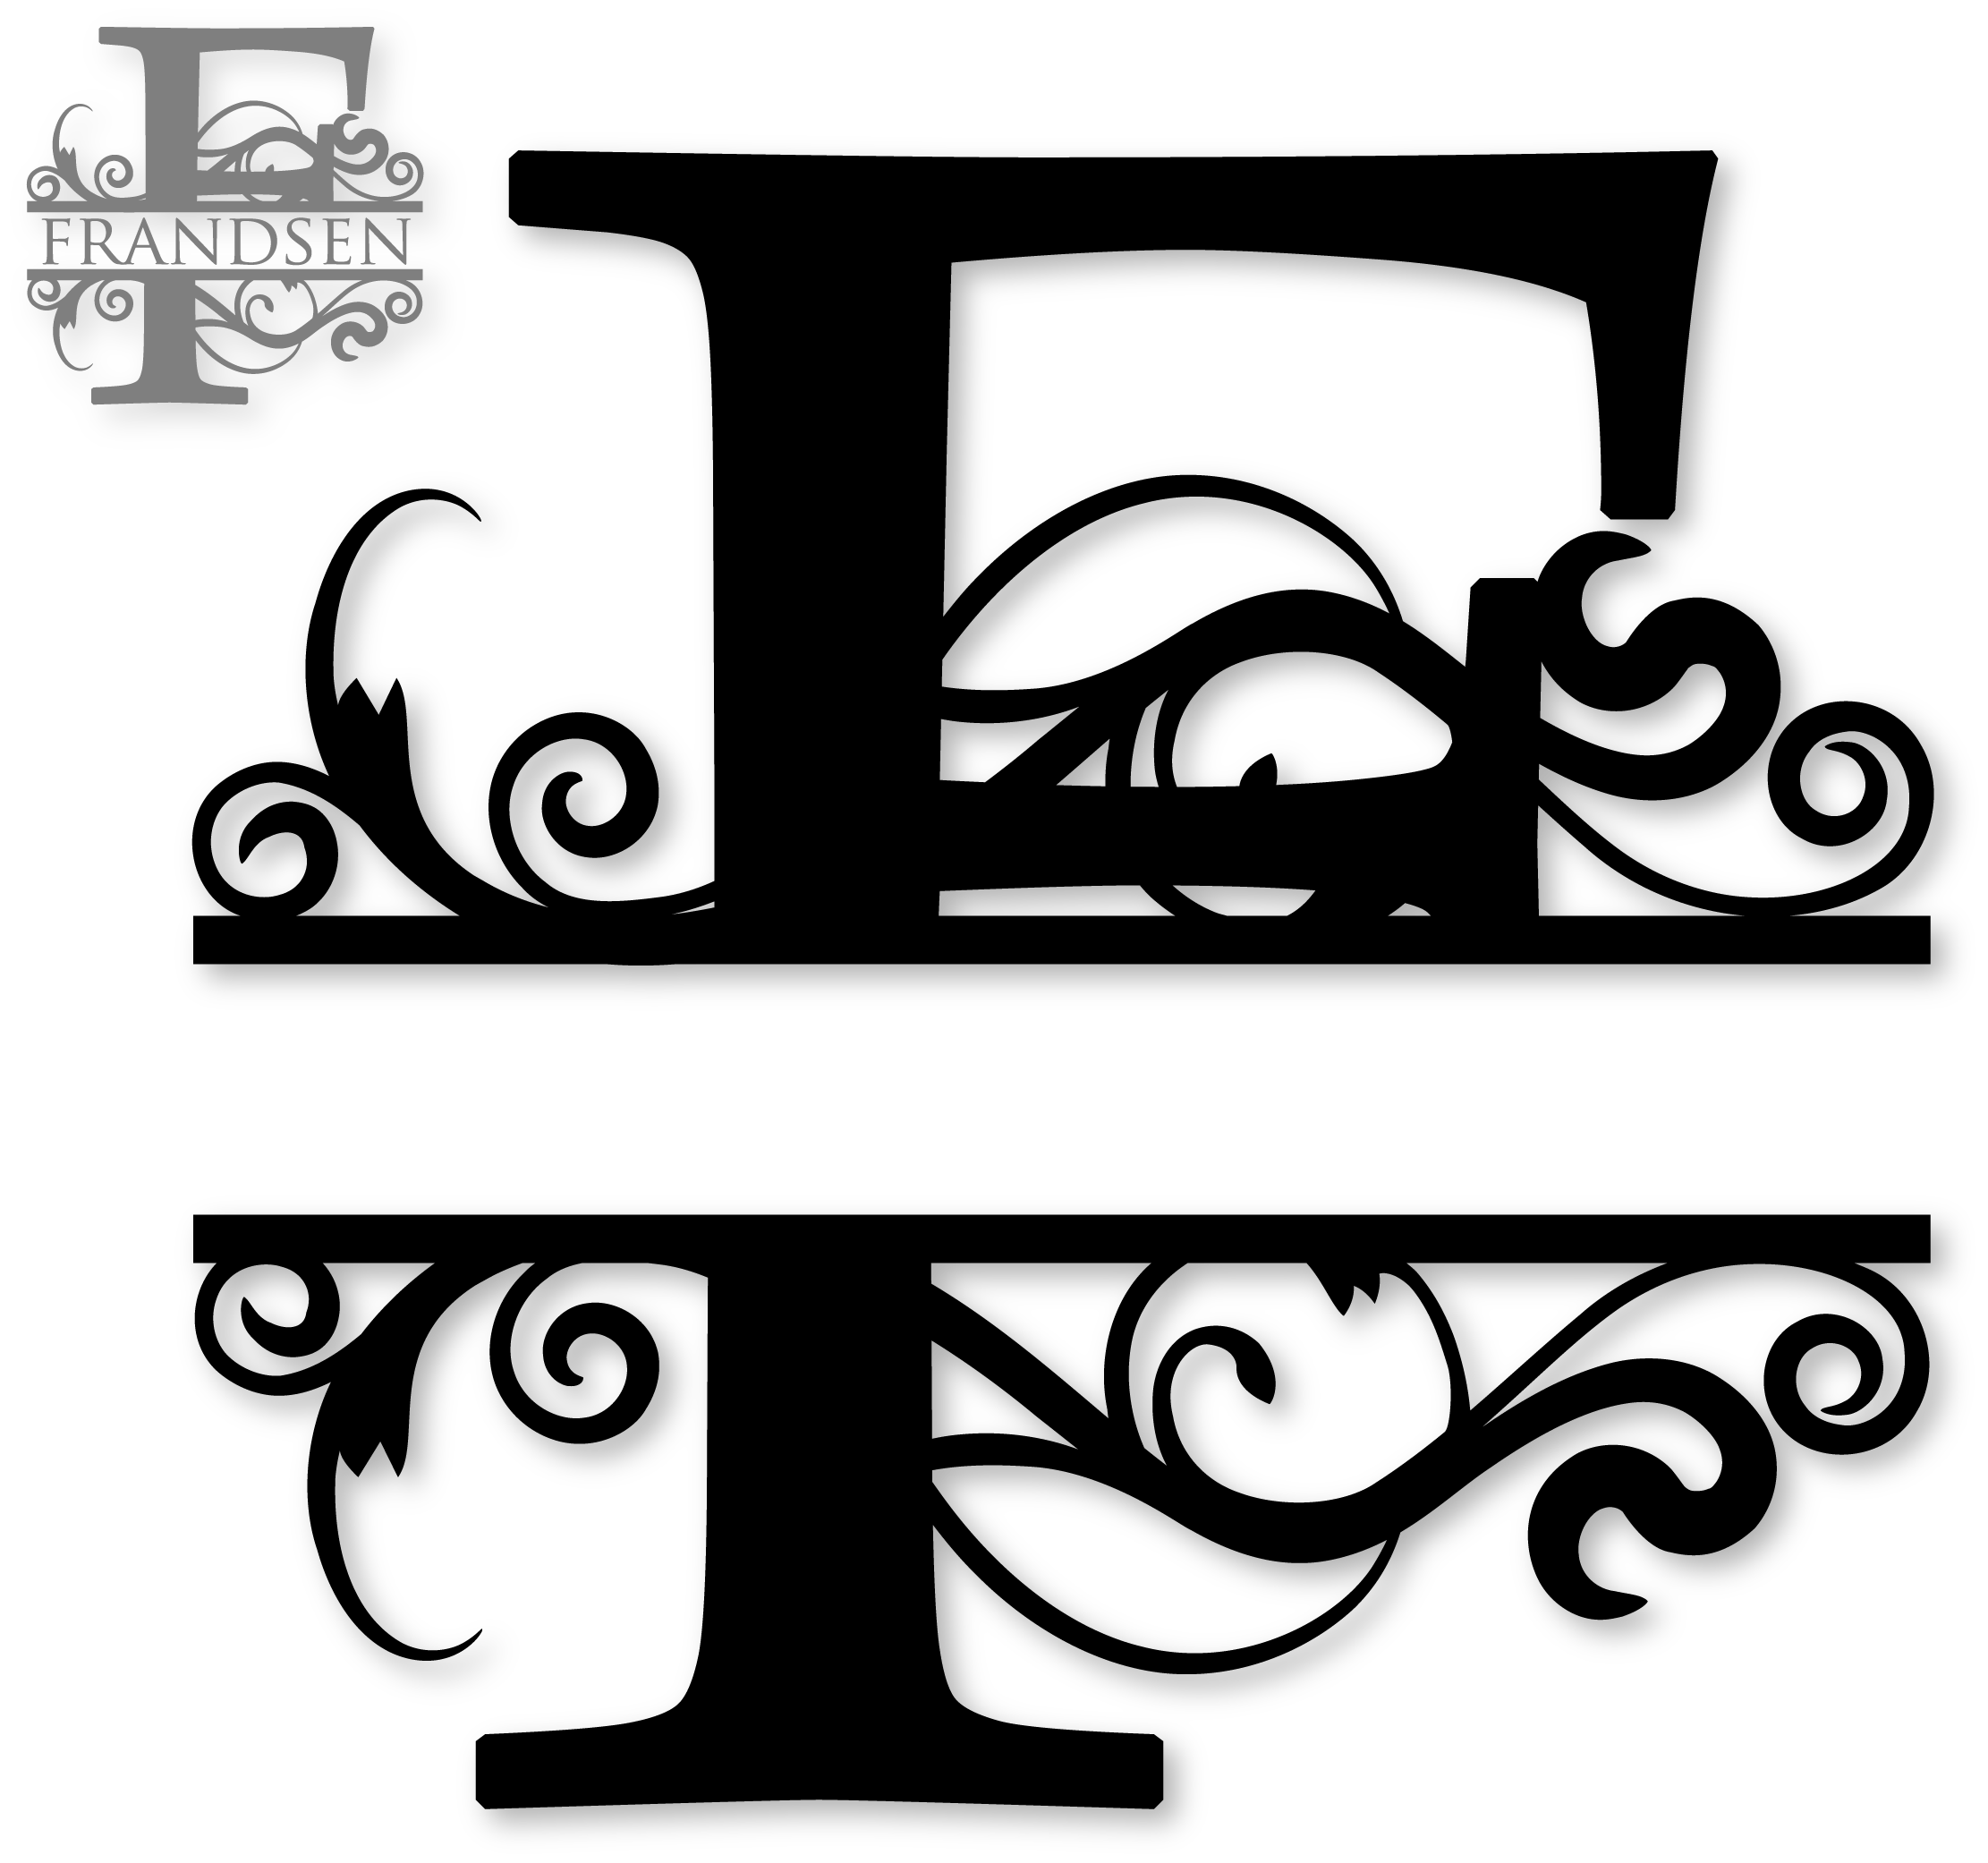 clipart letter f monogram - Clipground